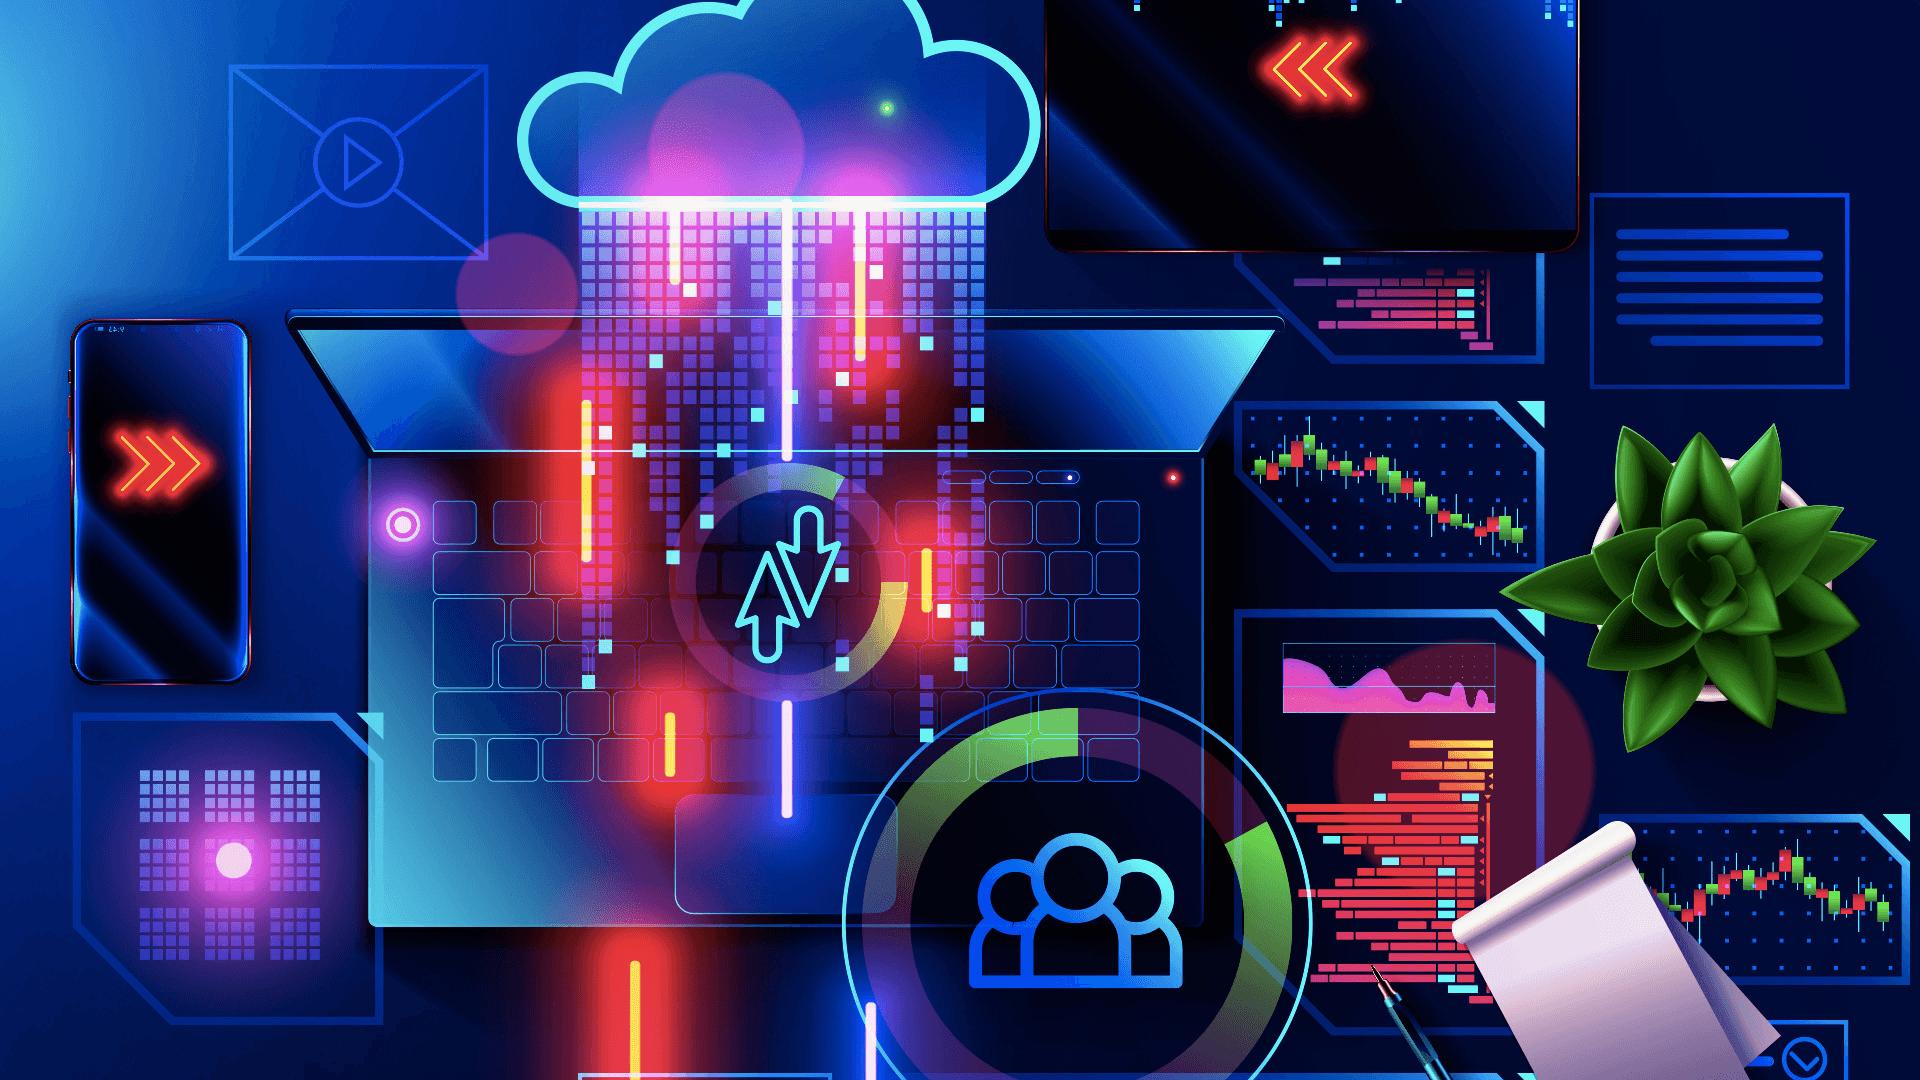 Hacker, Security, Hack, Cloud, Entwickler, Entwicklung, Synchronisation, Exploit, Hacking, Code, Cybersecurity, Quellcode, Programmierung, Programmierer, Developer, IoT, Sdk, cloudspeicher, Programmieren, Cyber, Sync, Development, Dev, Sourcecode, Shell, Terminal, Coder, Coding